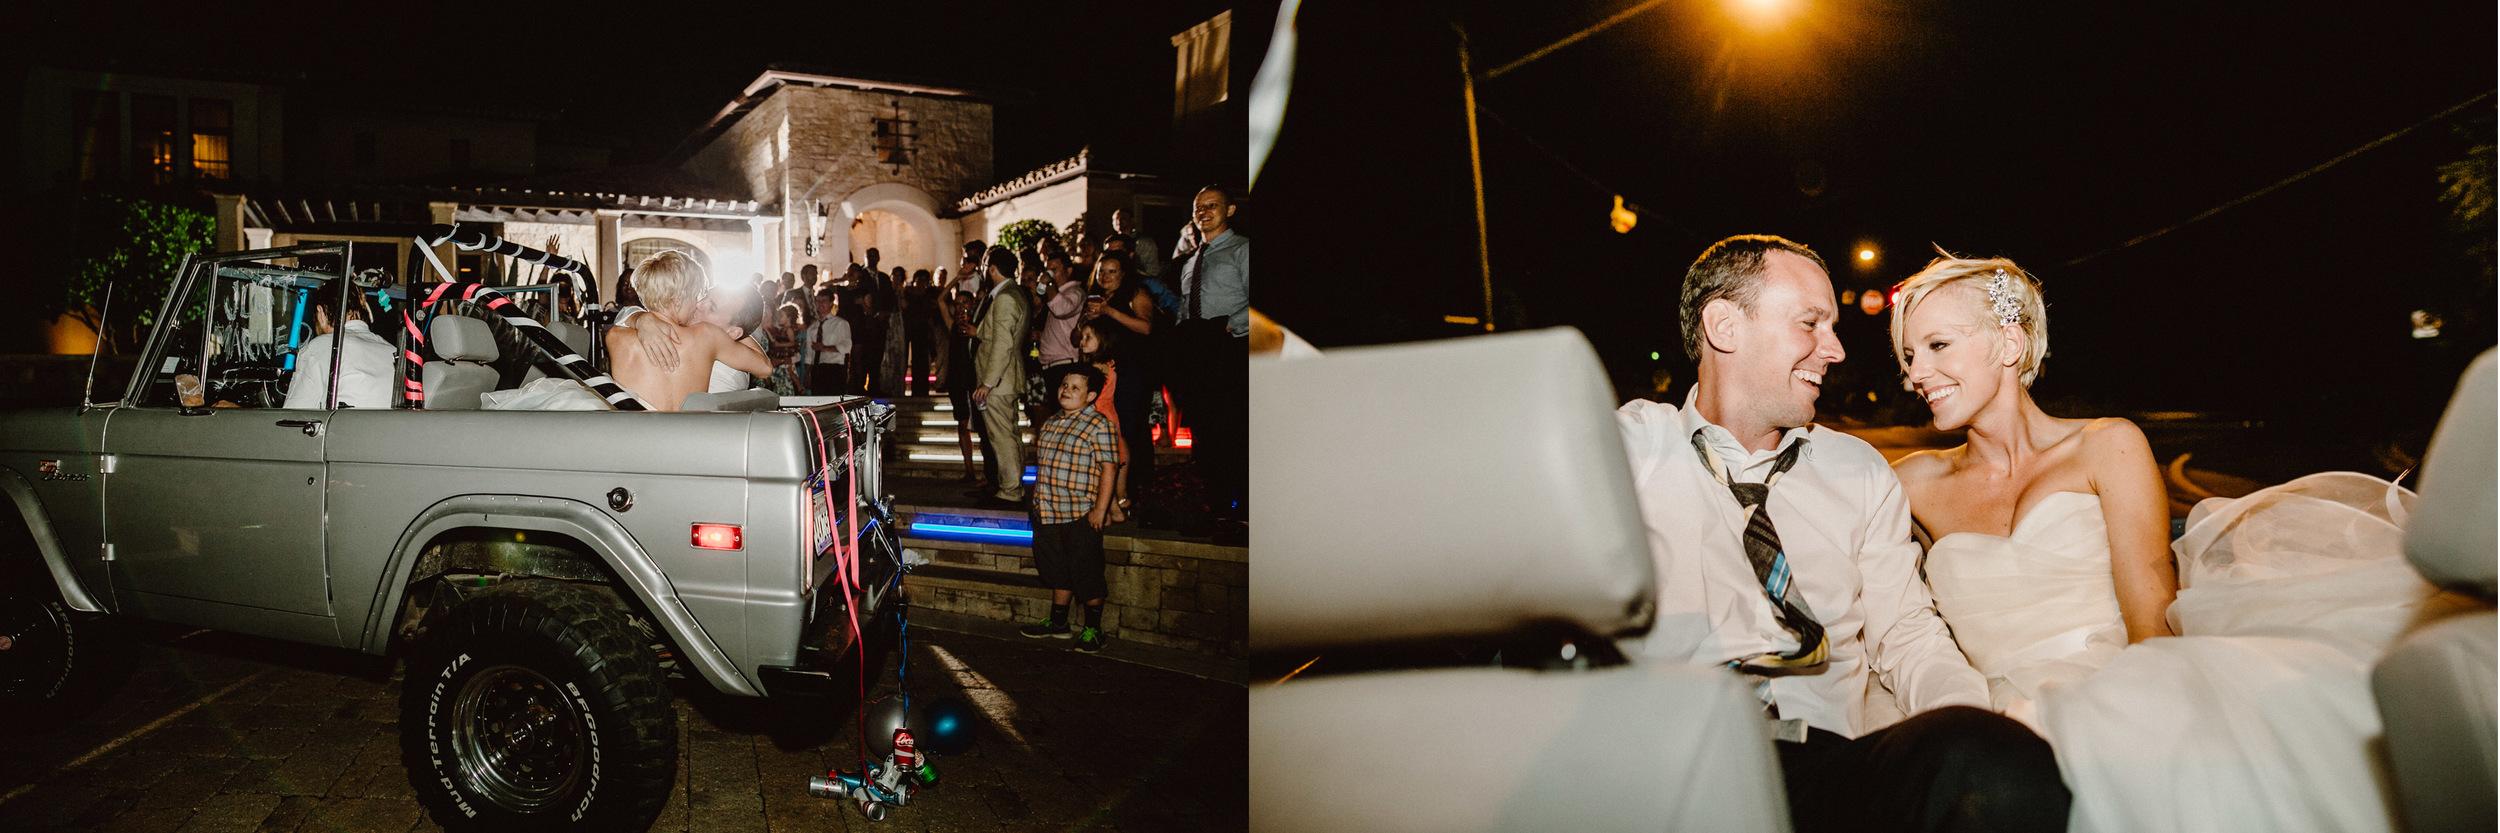 bronco-wedding-getaway - 1.jpg